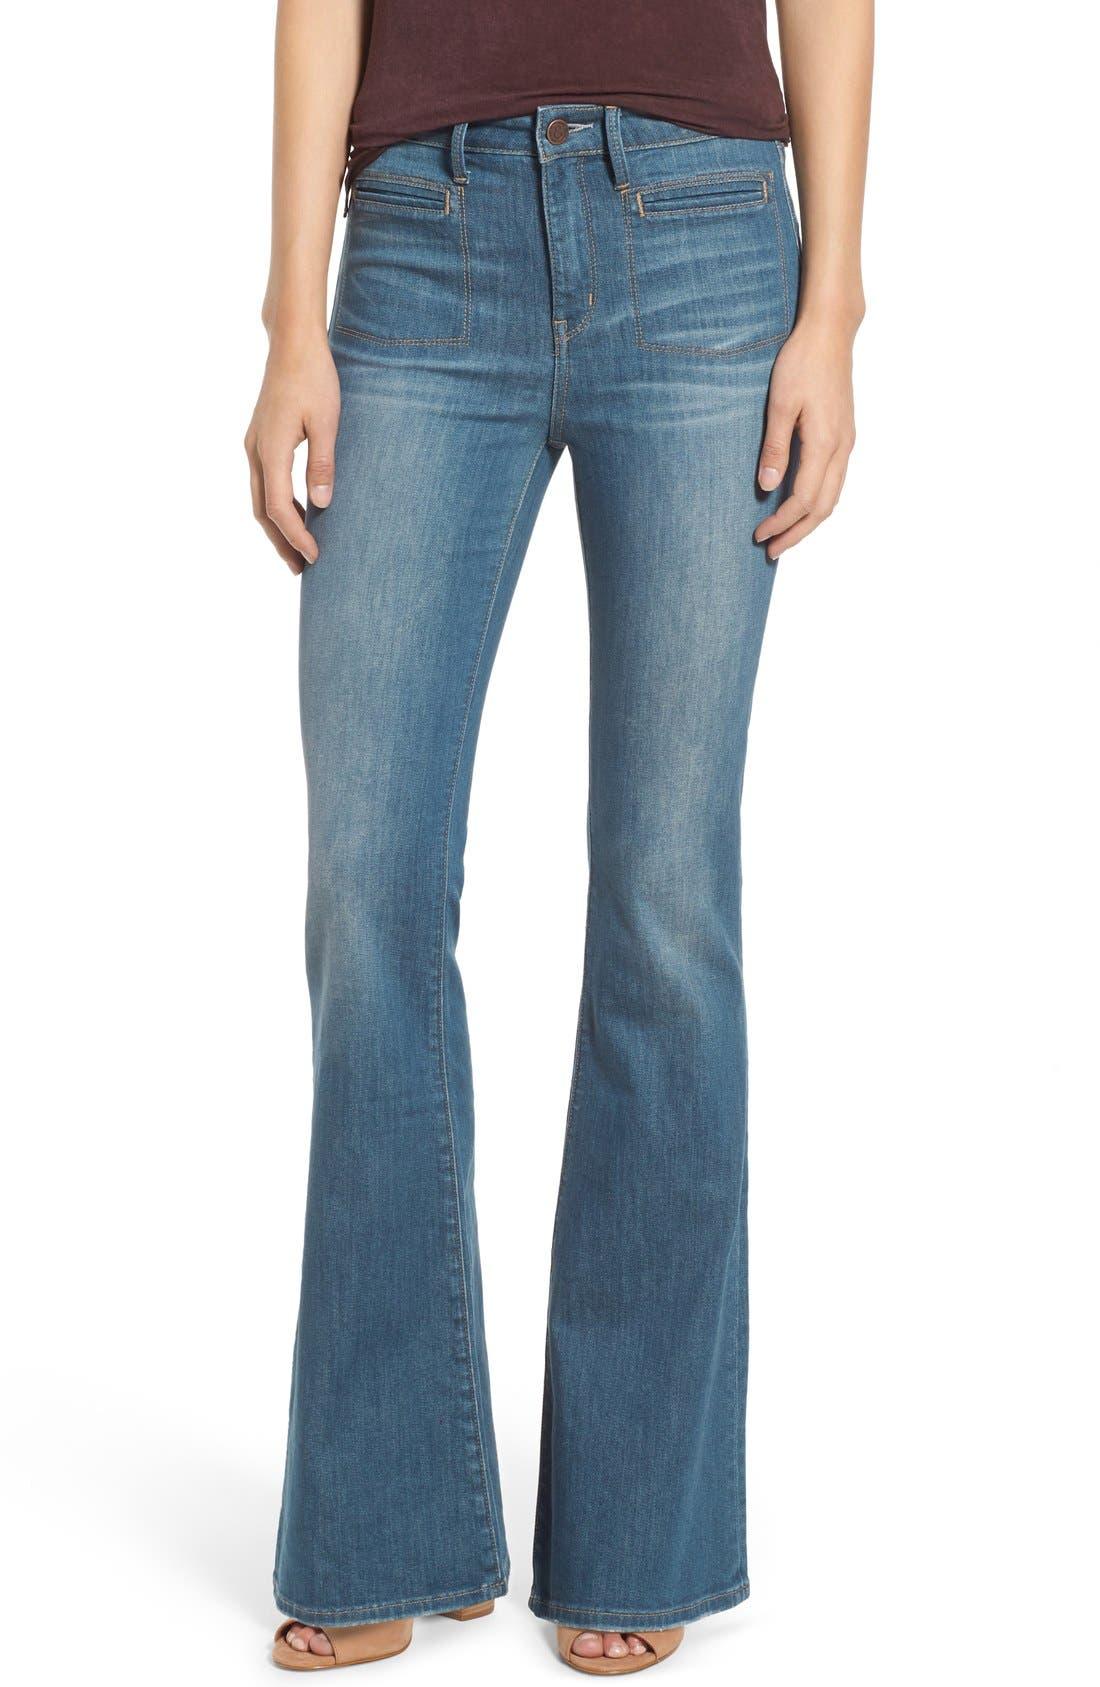 Treasure&Bond High Rise Skinny Flare Jeans,                             Main thumbnail 1, color,                             400